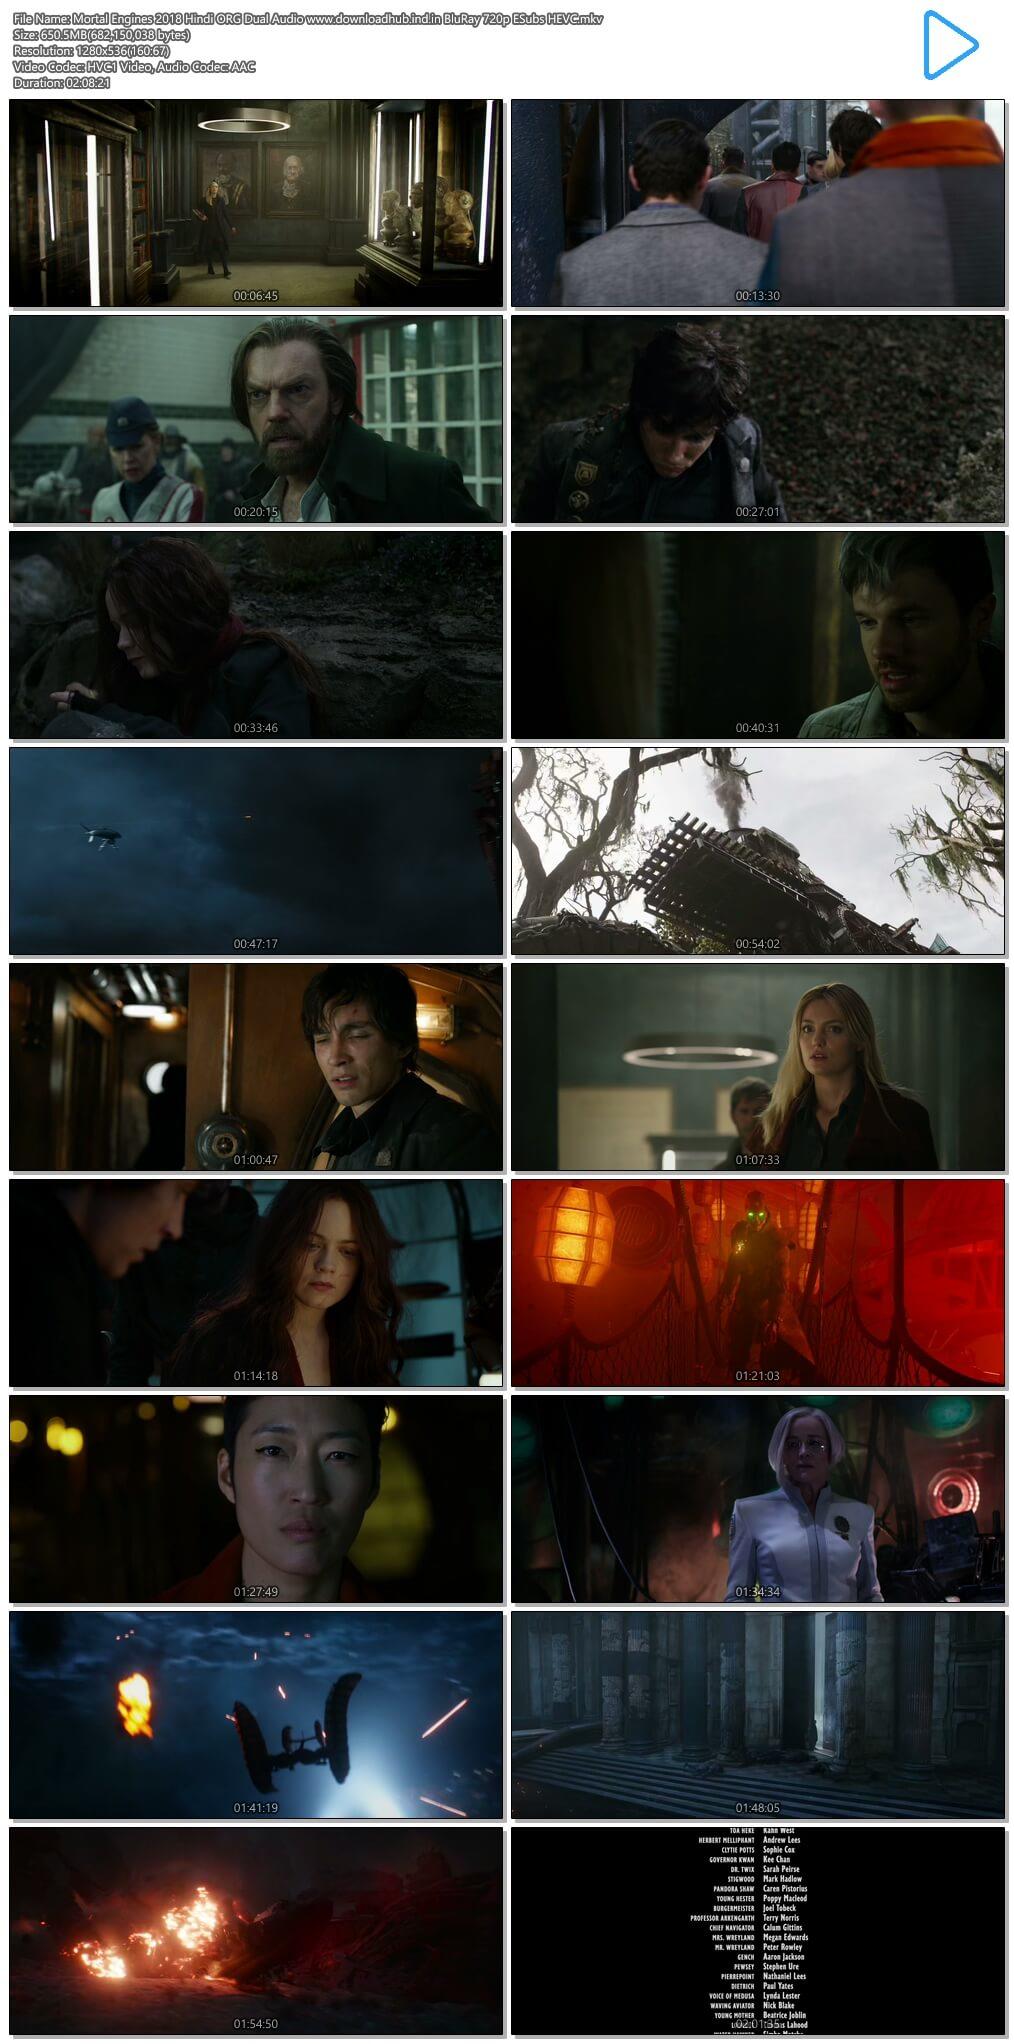 Mortal Engines 2018 Hindi ORG Dual Audio 650MB BluRay 720p ESubs HEVC